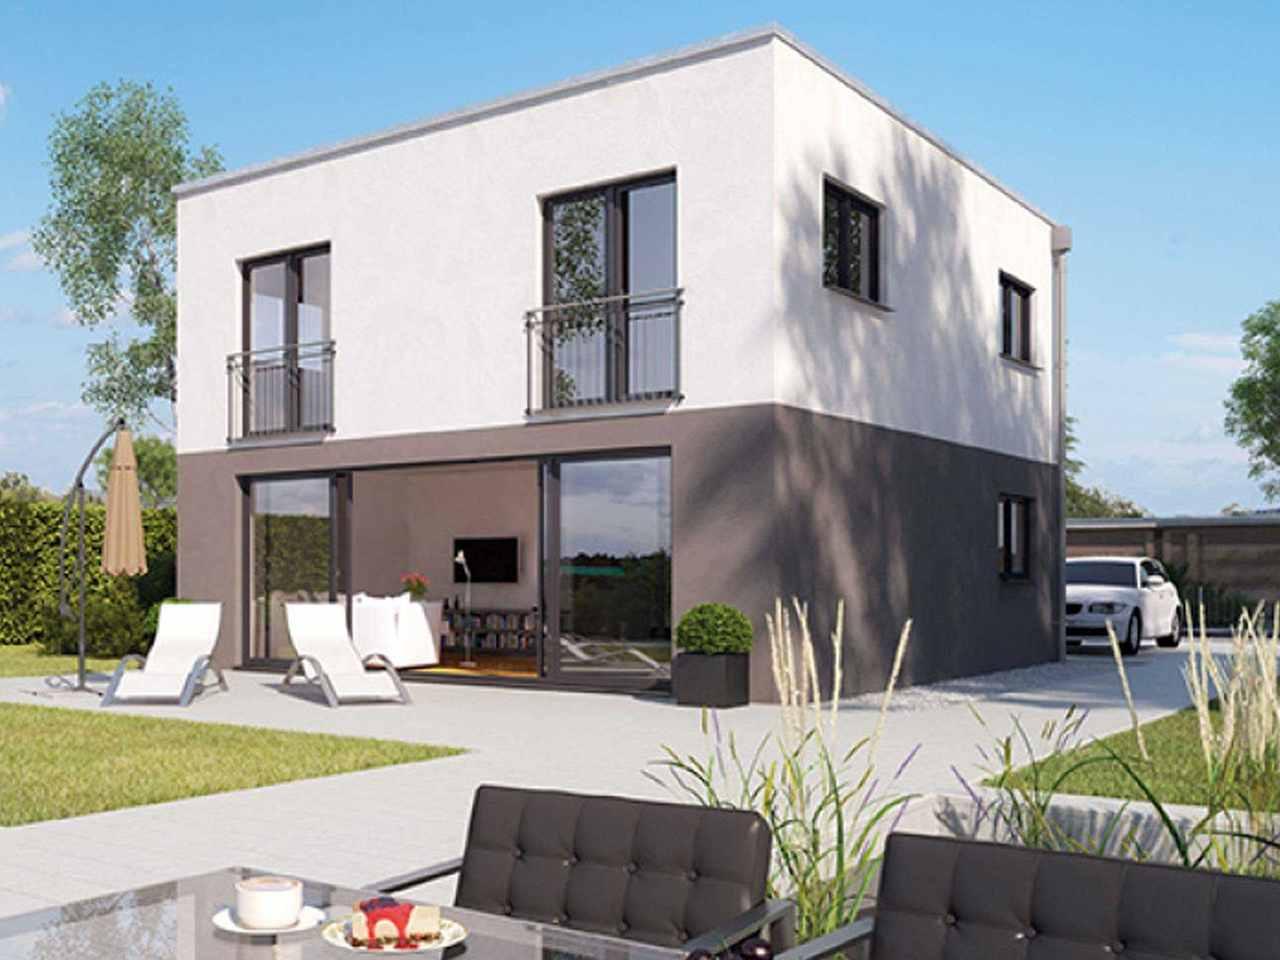 ICON 3 City mit Flachdach - Dennert Raumfabrik